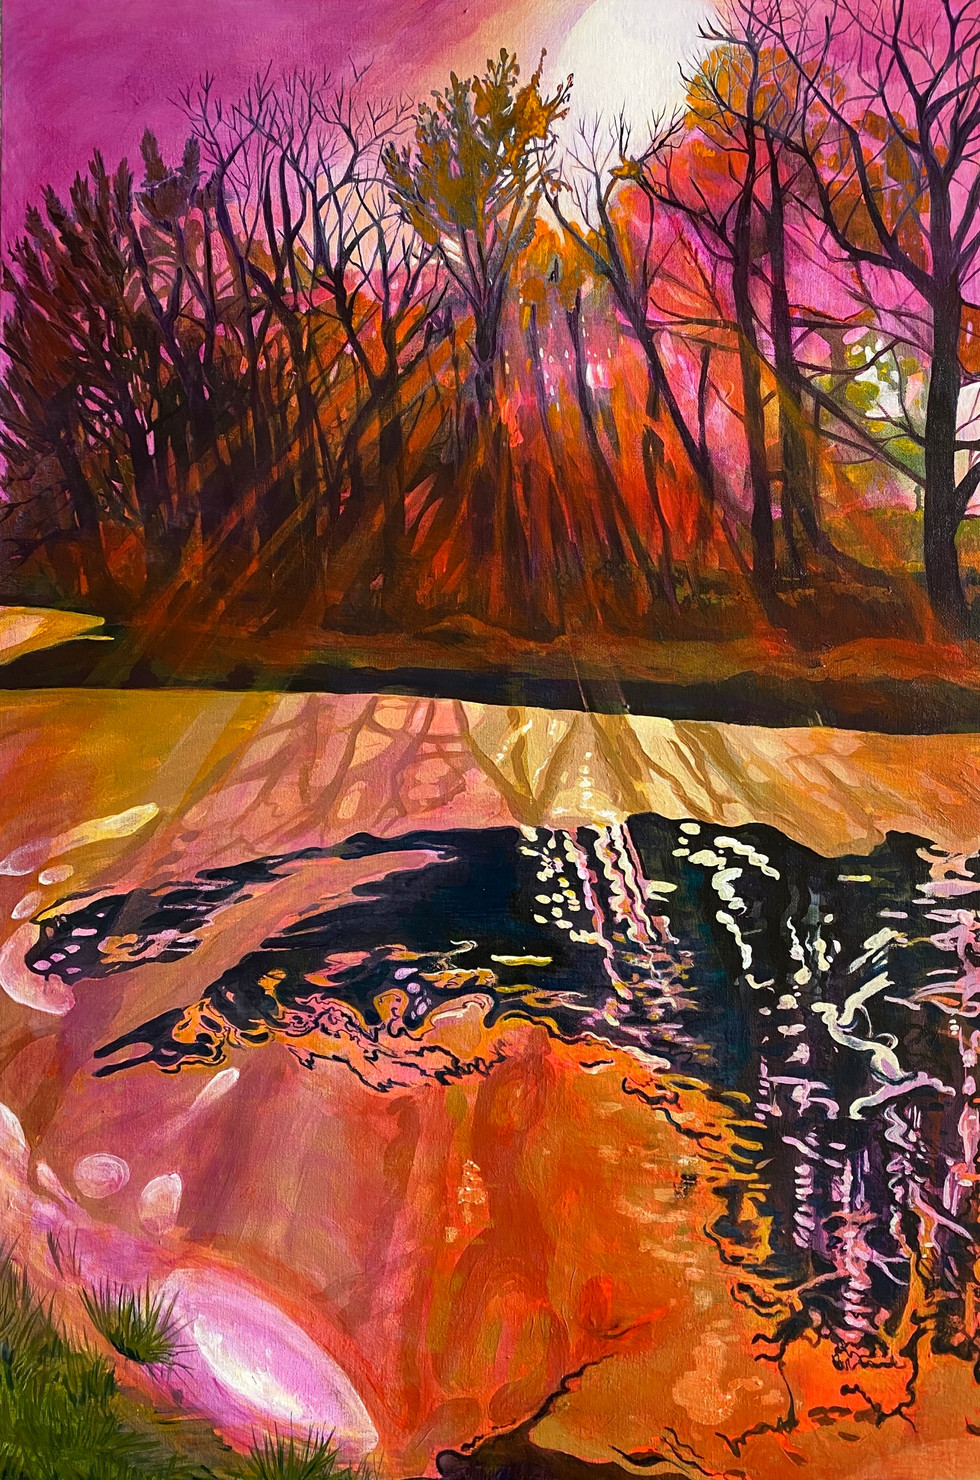 Croxteth Park   By Natalie Gilmore